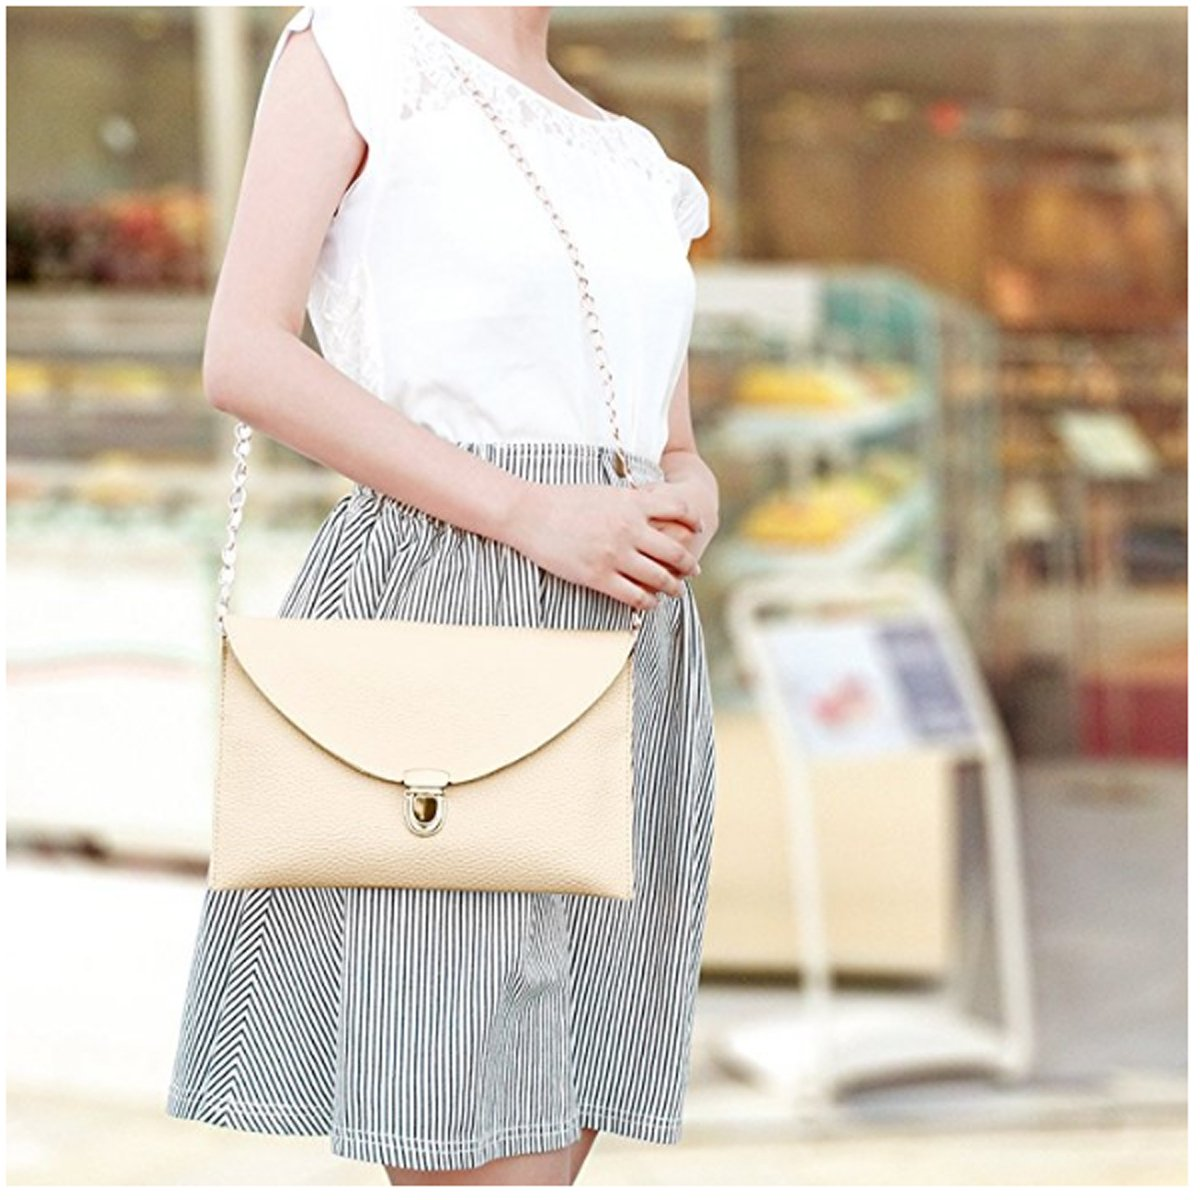 Amaze Fashion Women Handbag Shoulder Bags Envelope Clutch Crossbody Satchel Purse Tote Messenger Leather Lady Bag